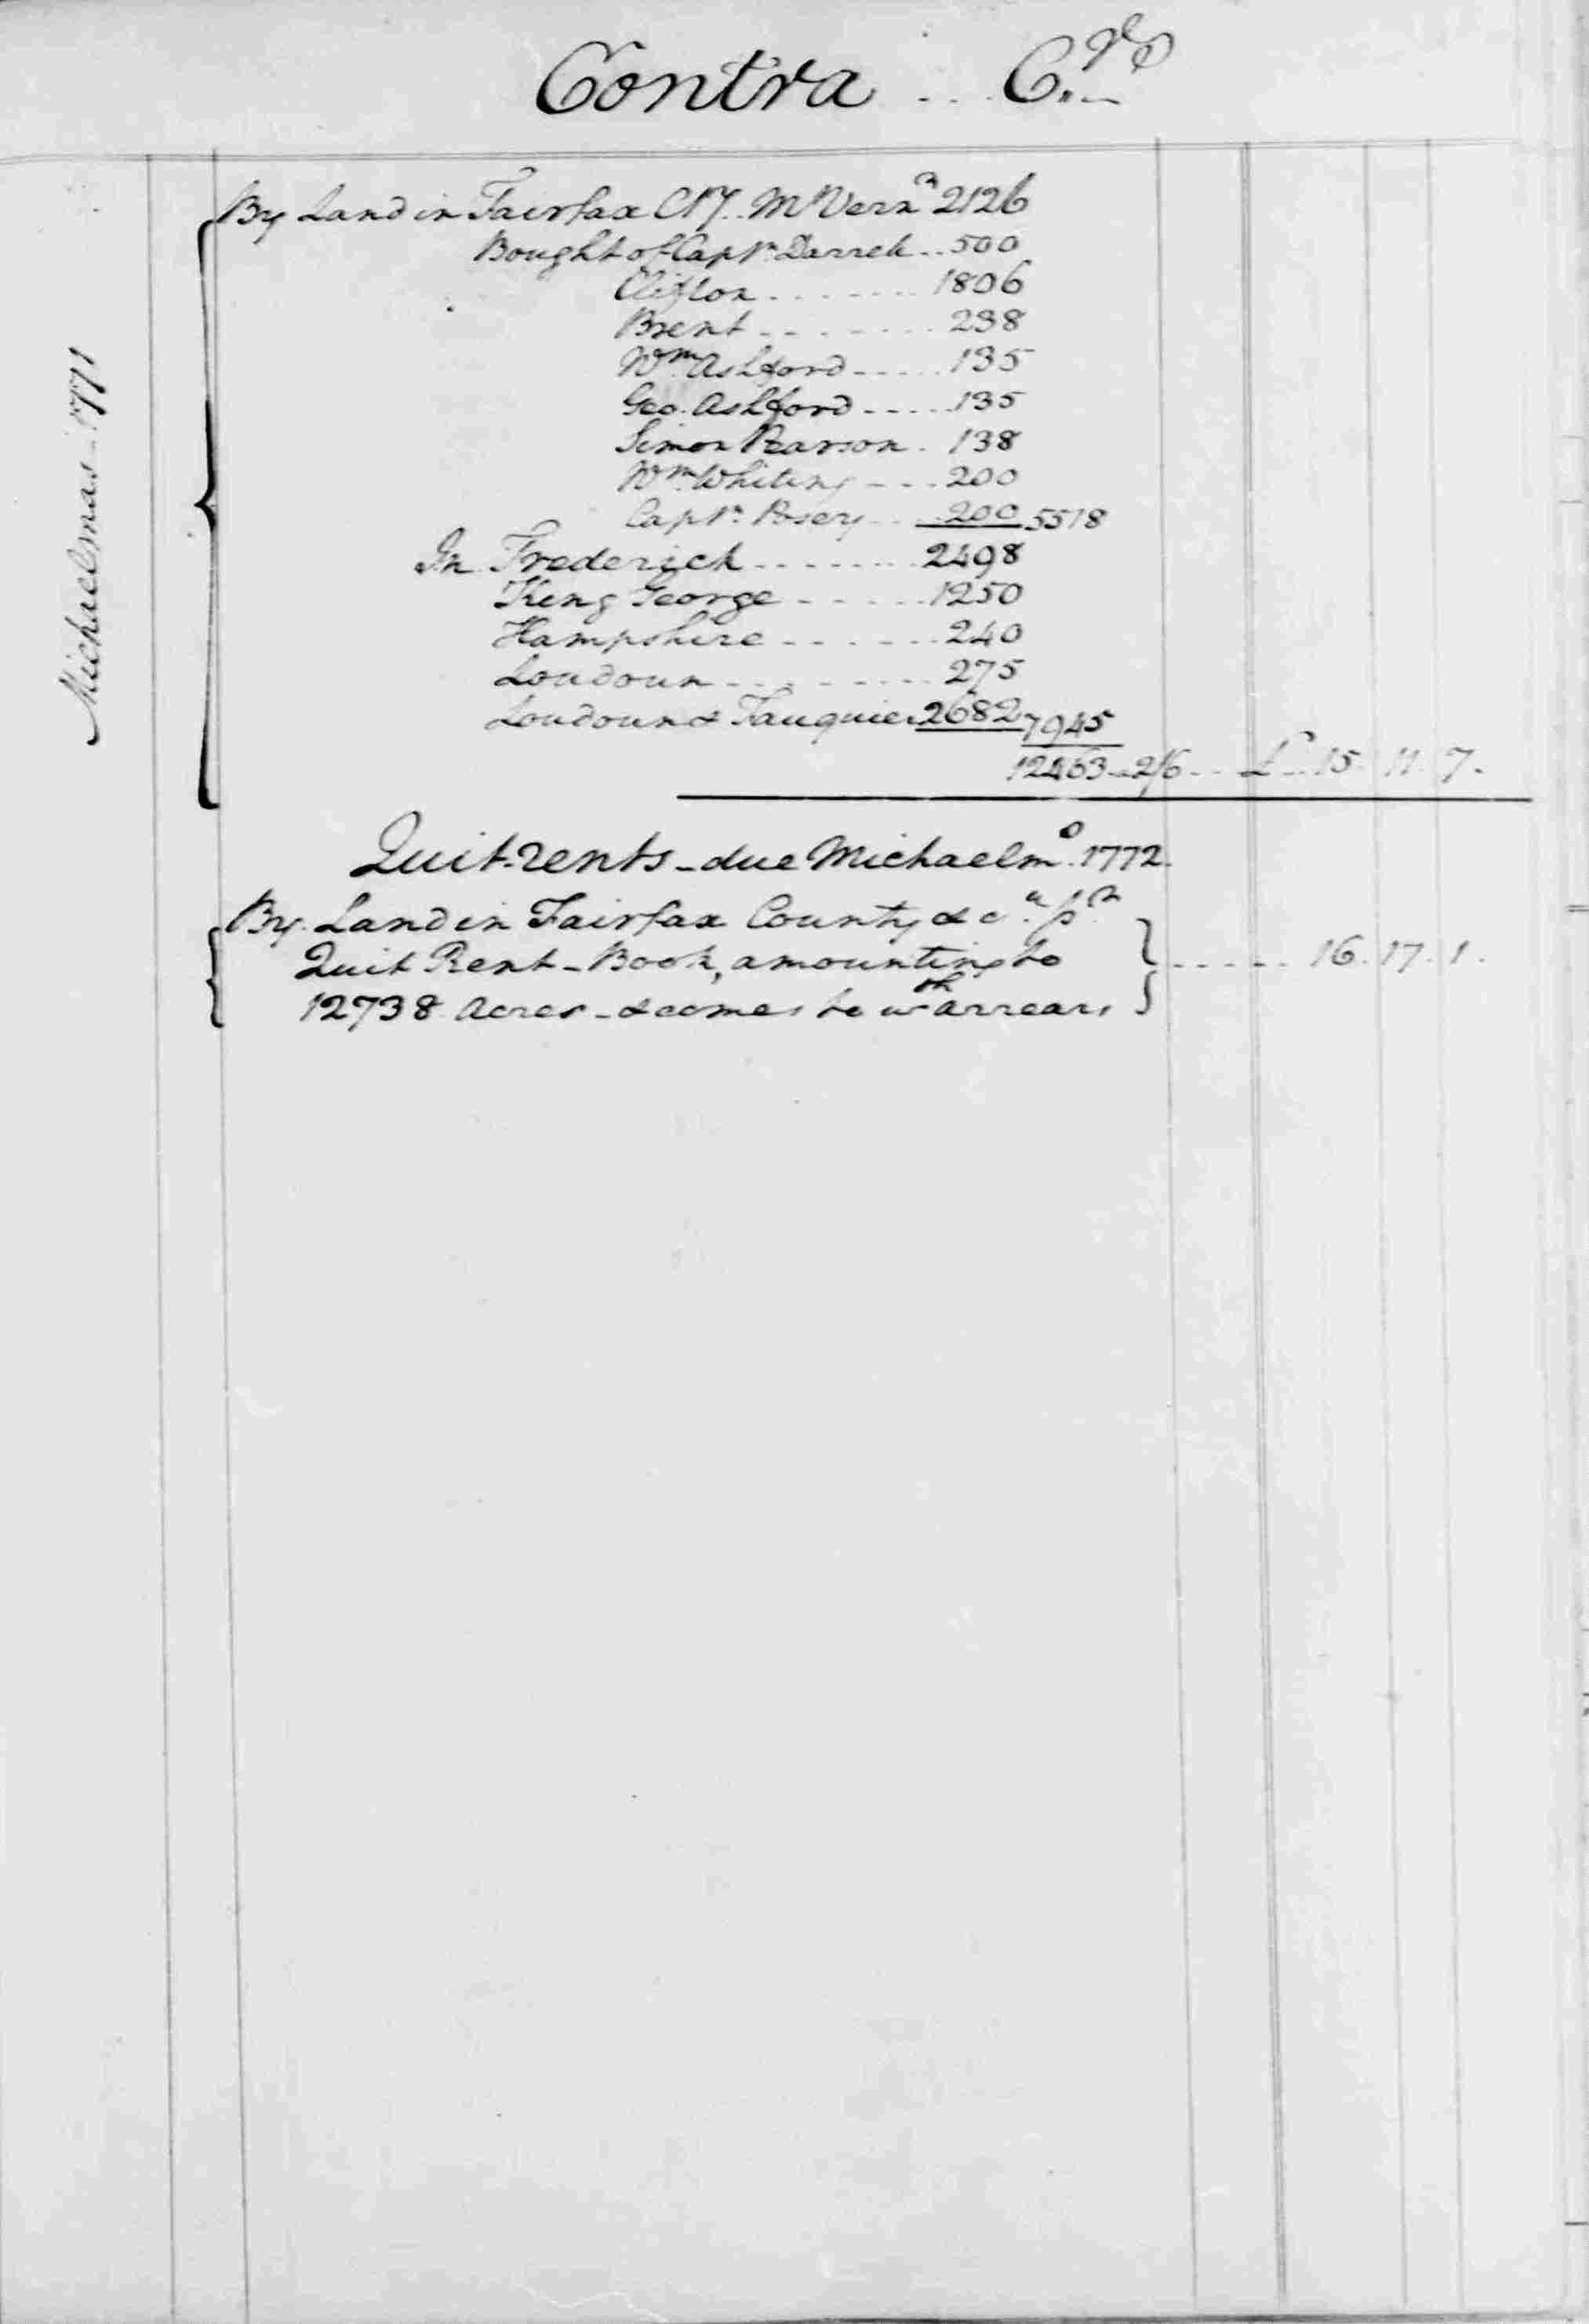 Ledger B, folio 53, right side